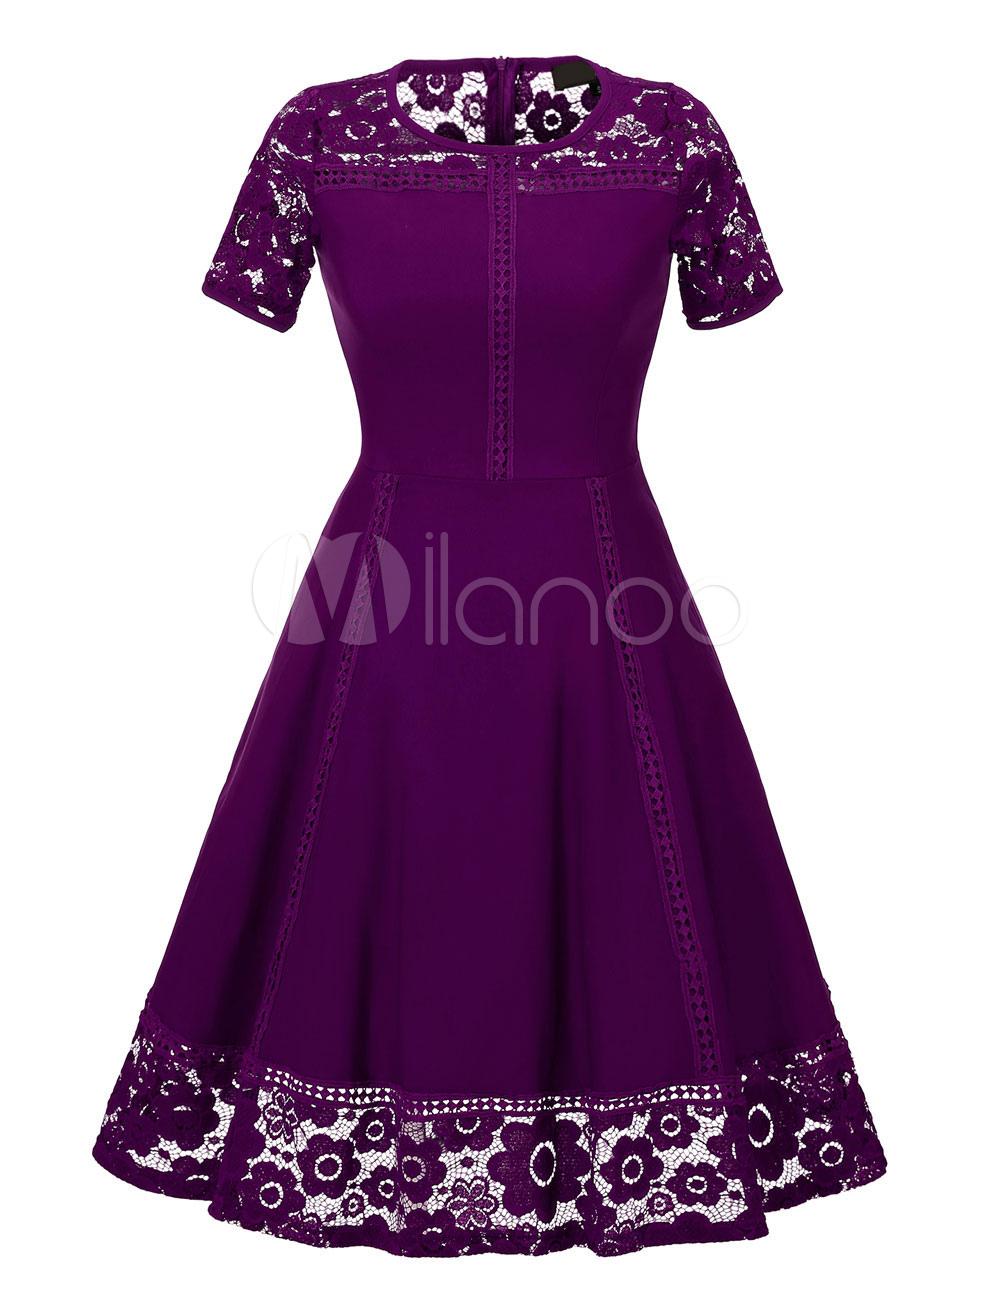 Women's Vintage Dress Purple Lace Patch Short Sleeve Pleated Retro Flare Dress (Women\\'s Clothing Vintage Dresses) photo